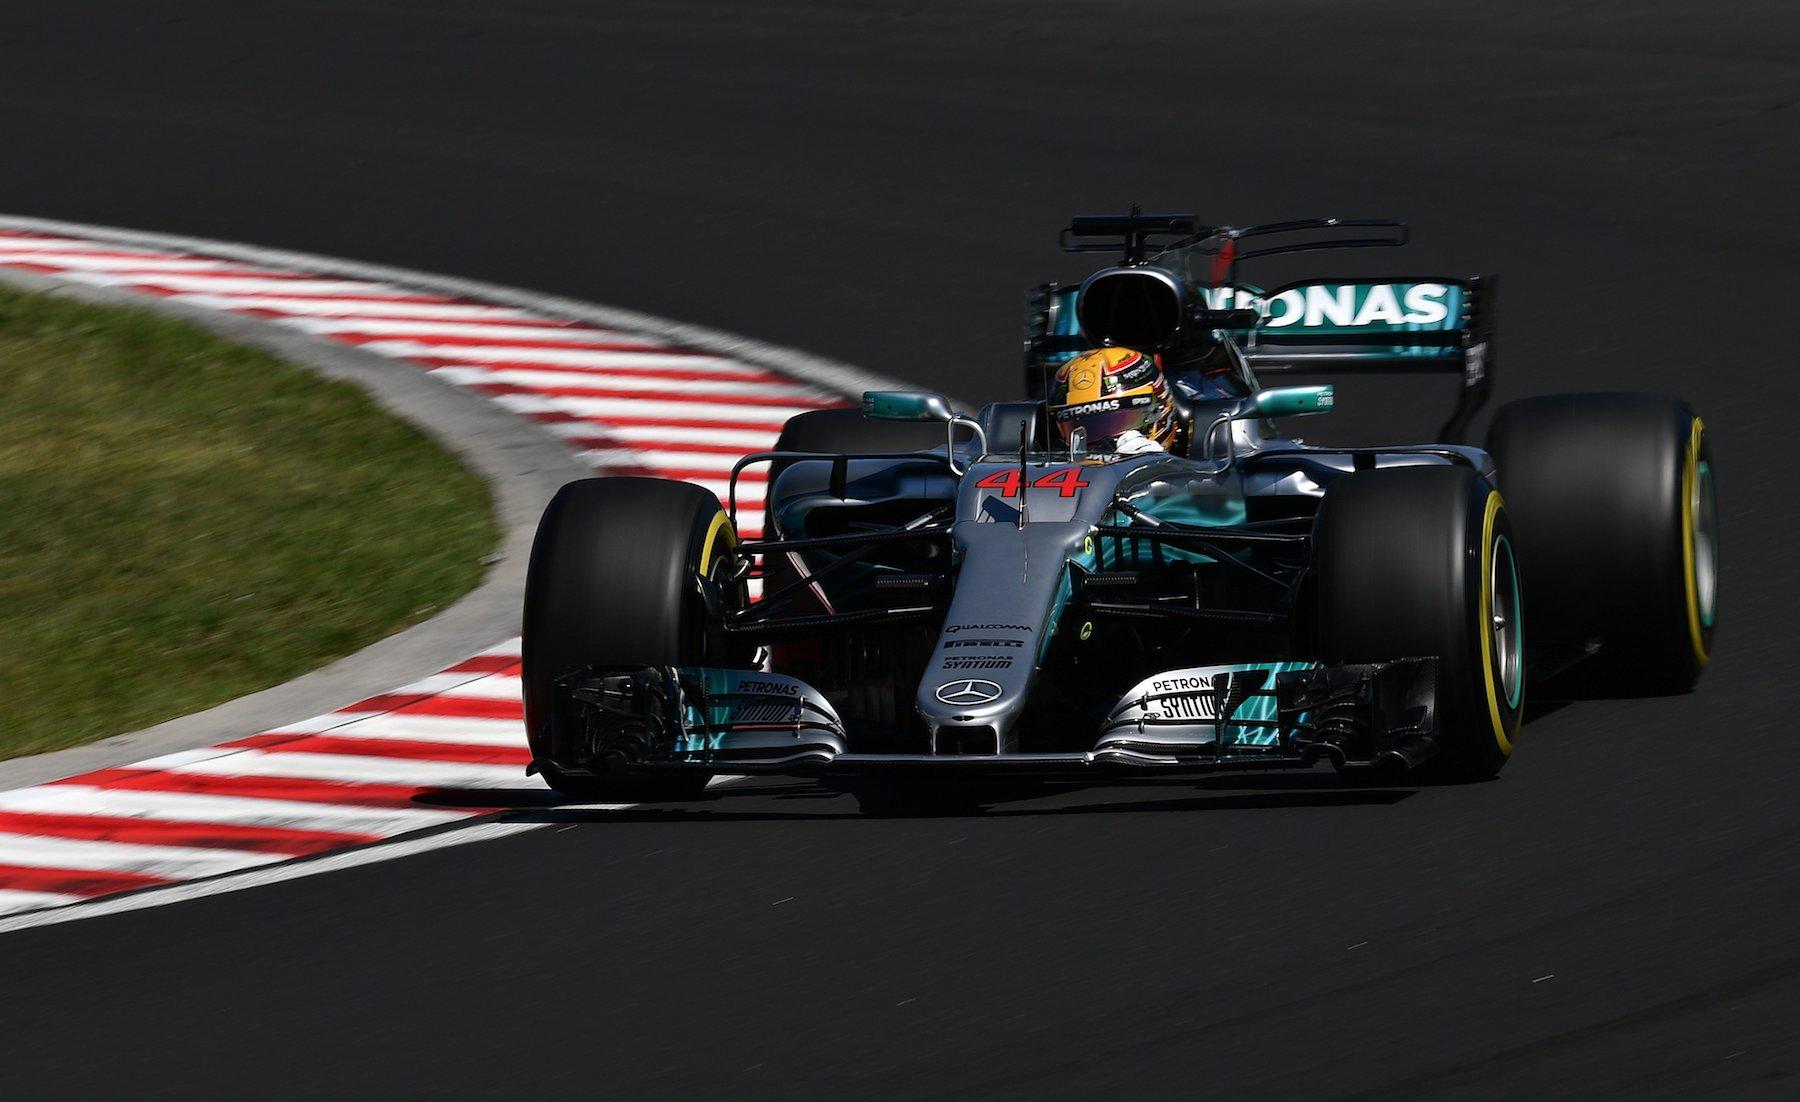 M 2017 Lewis Hamilton | Mercedes W08 | 2017 Hungarian GP P4 1 copy.jpg